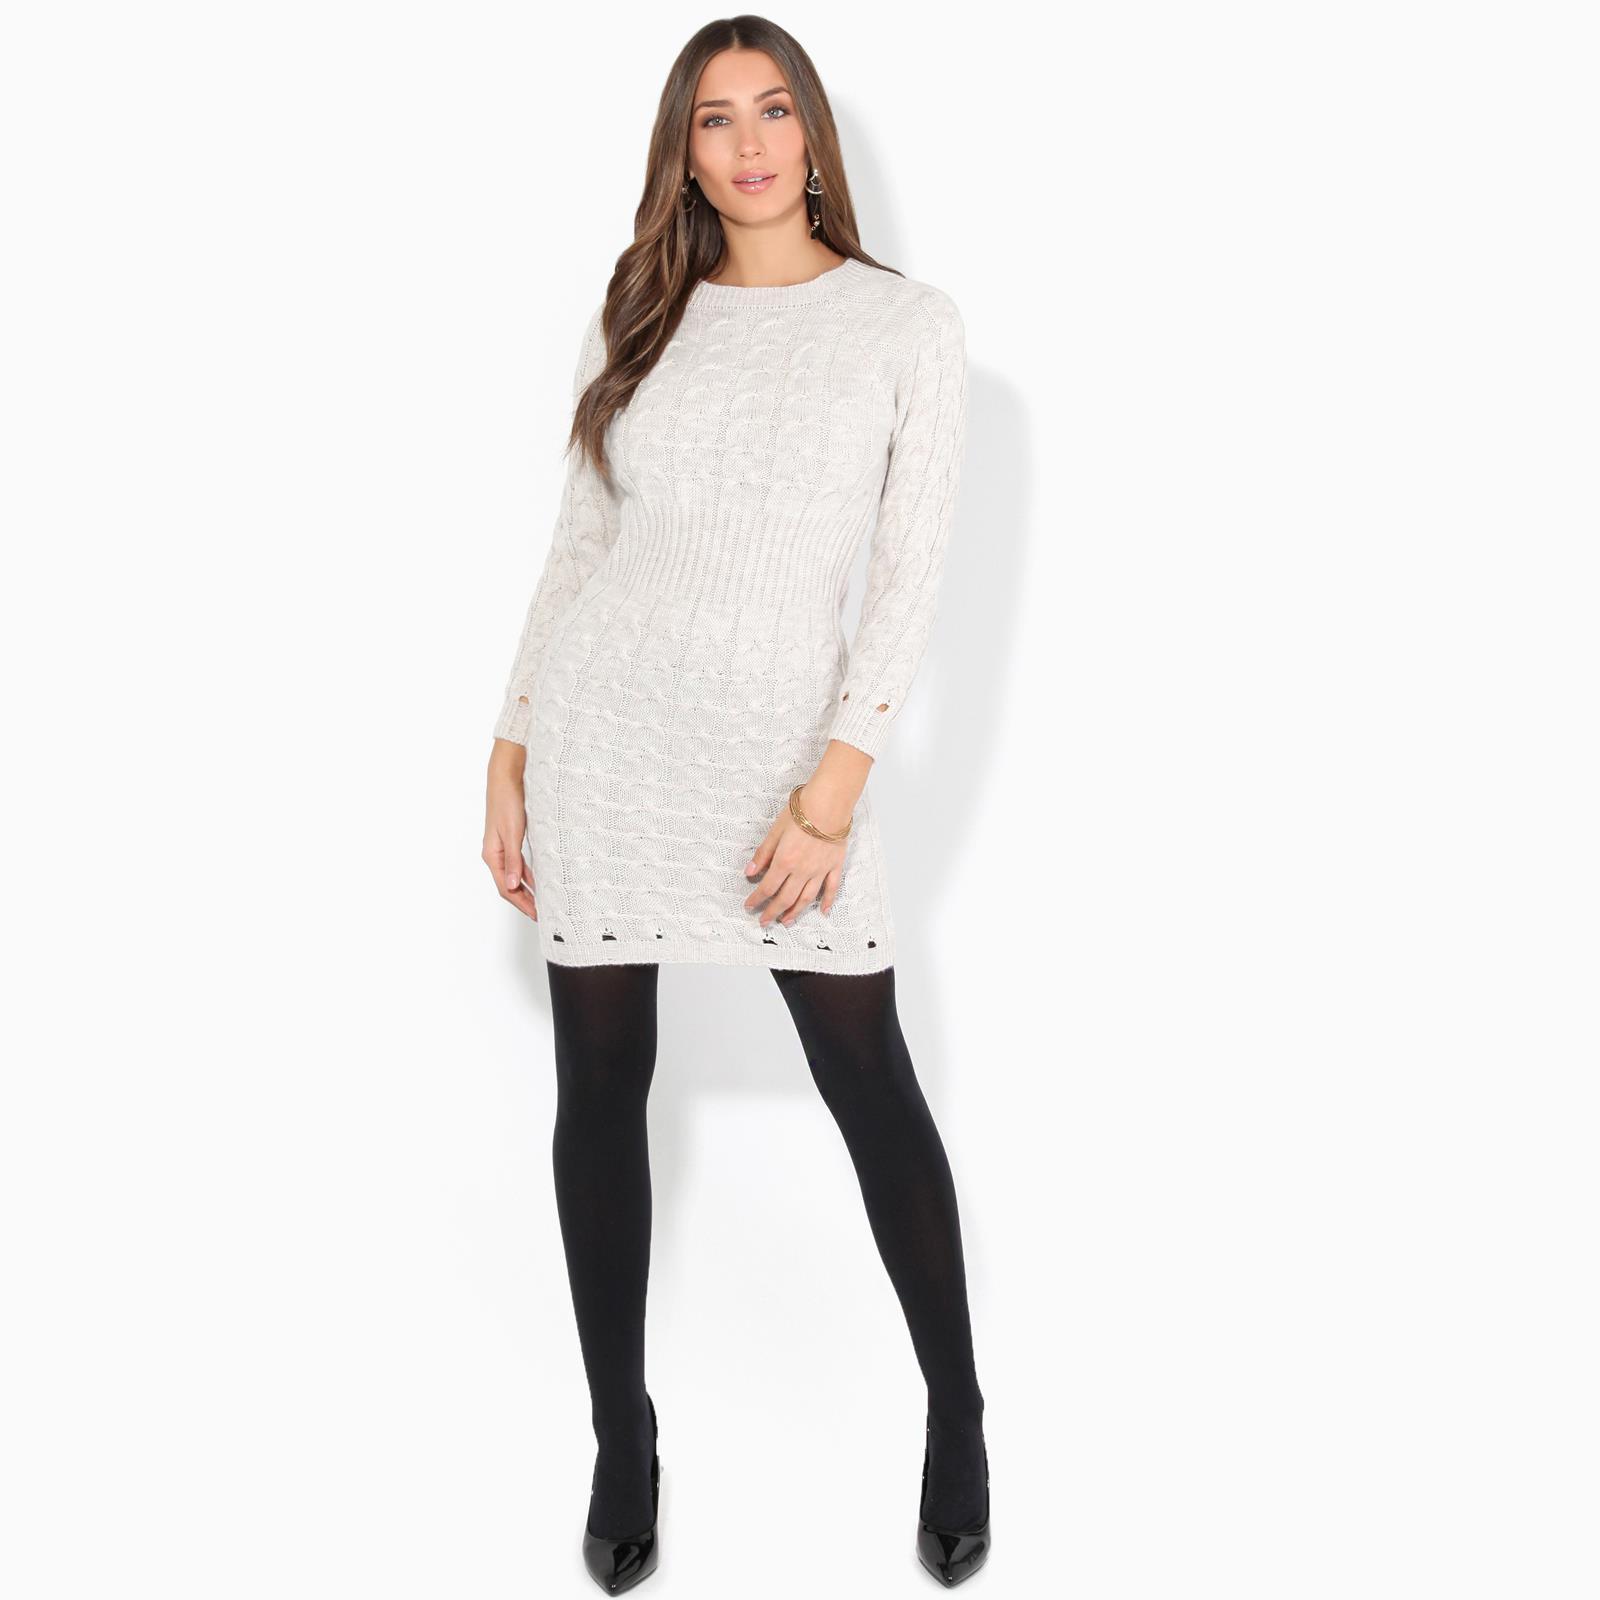 Womens-Ladies-Jumper-Dress-Longsleeve-Mini-Warm-Winter-Knit-Top-Bodycon thumbnail 3